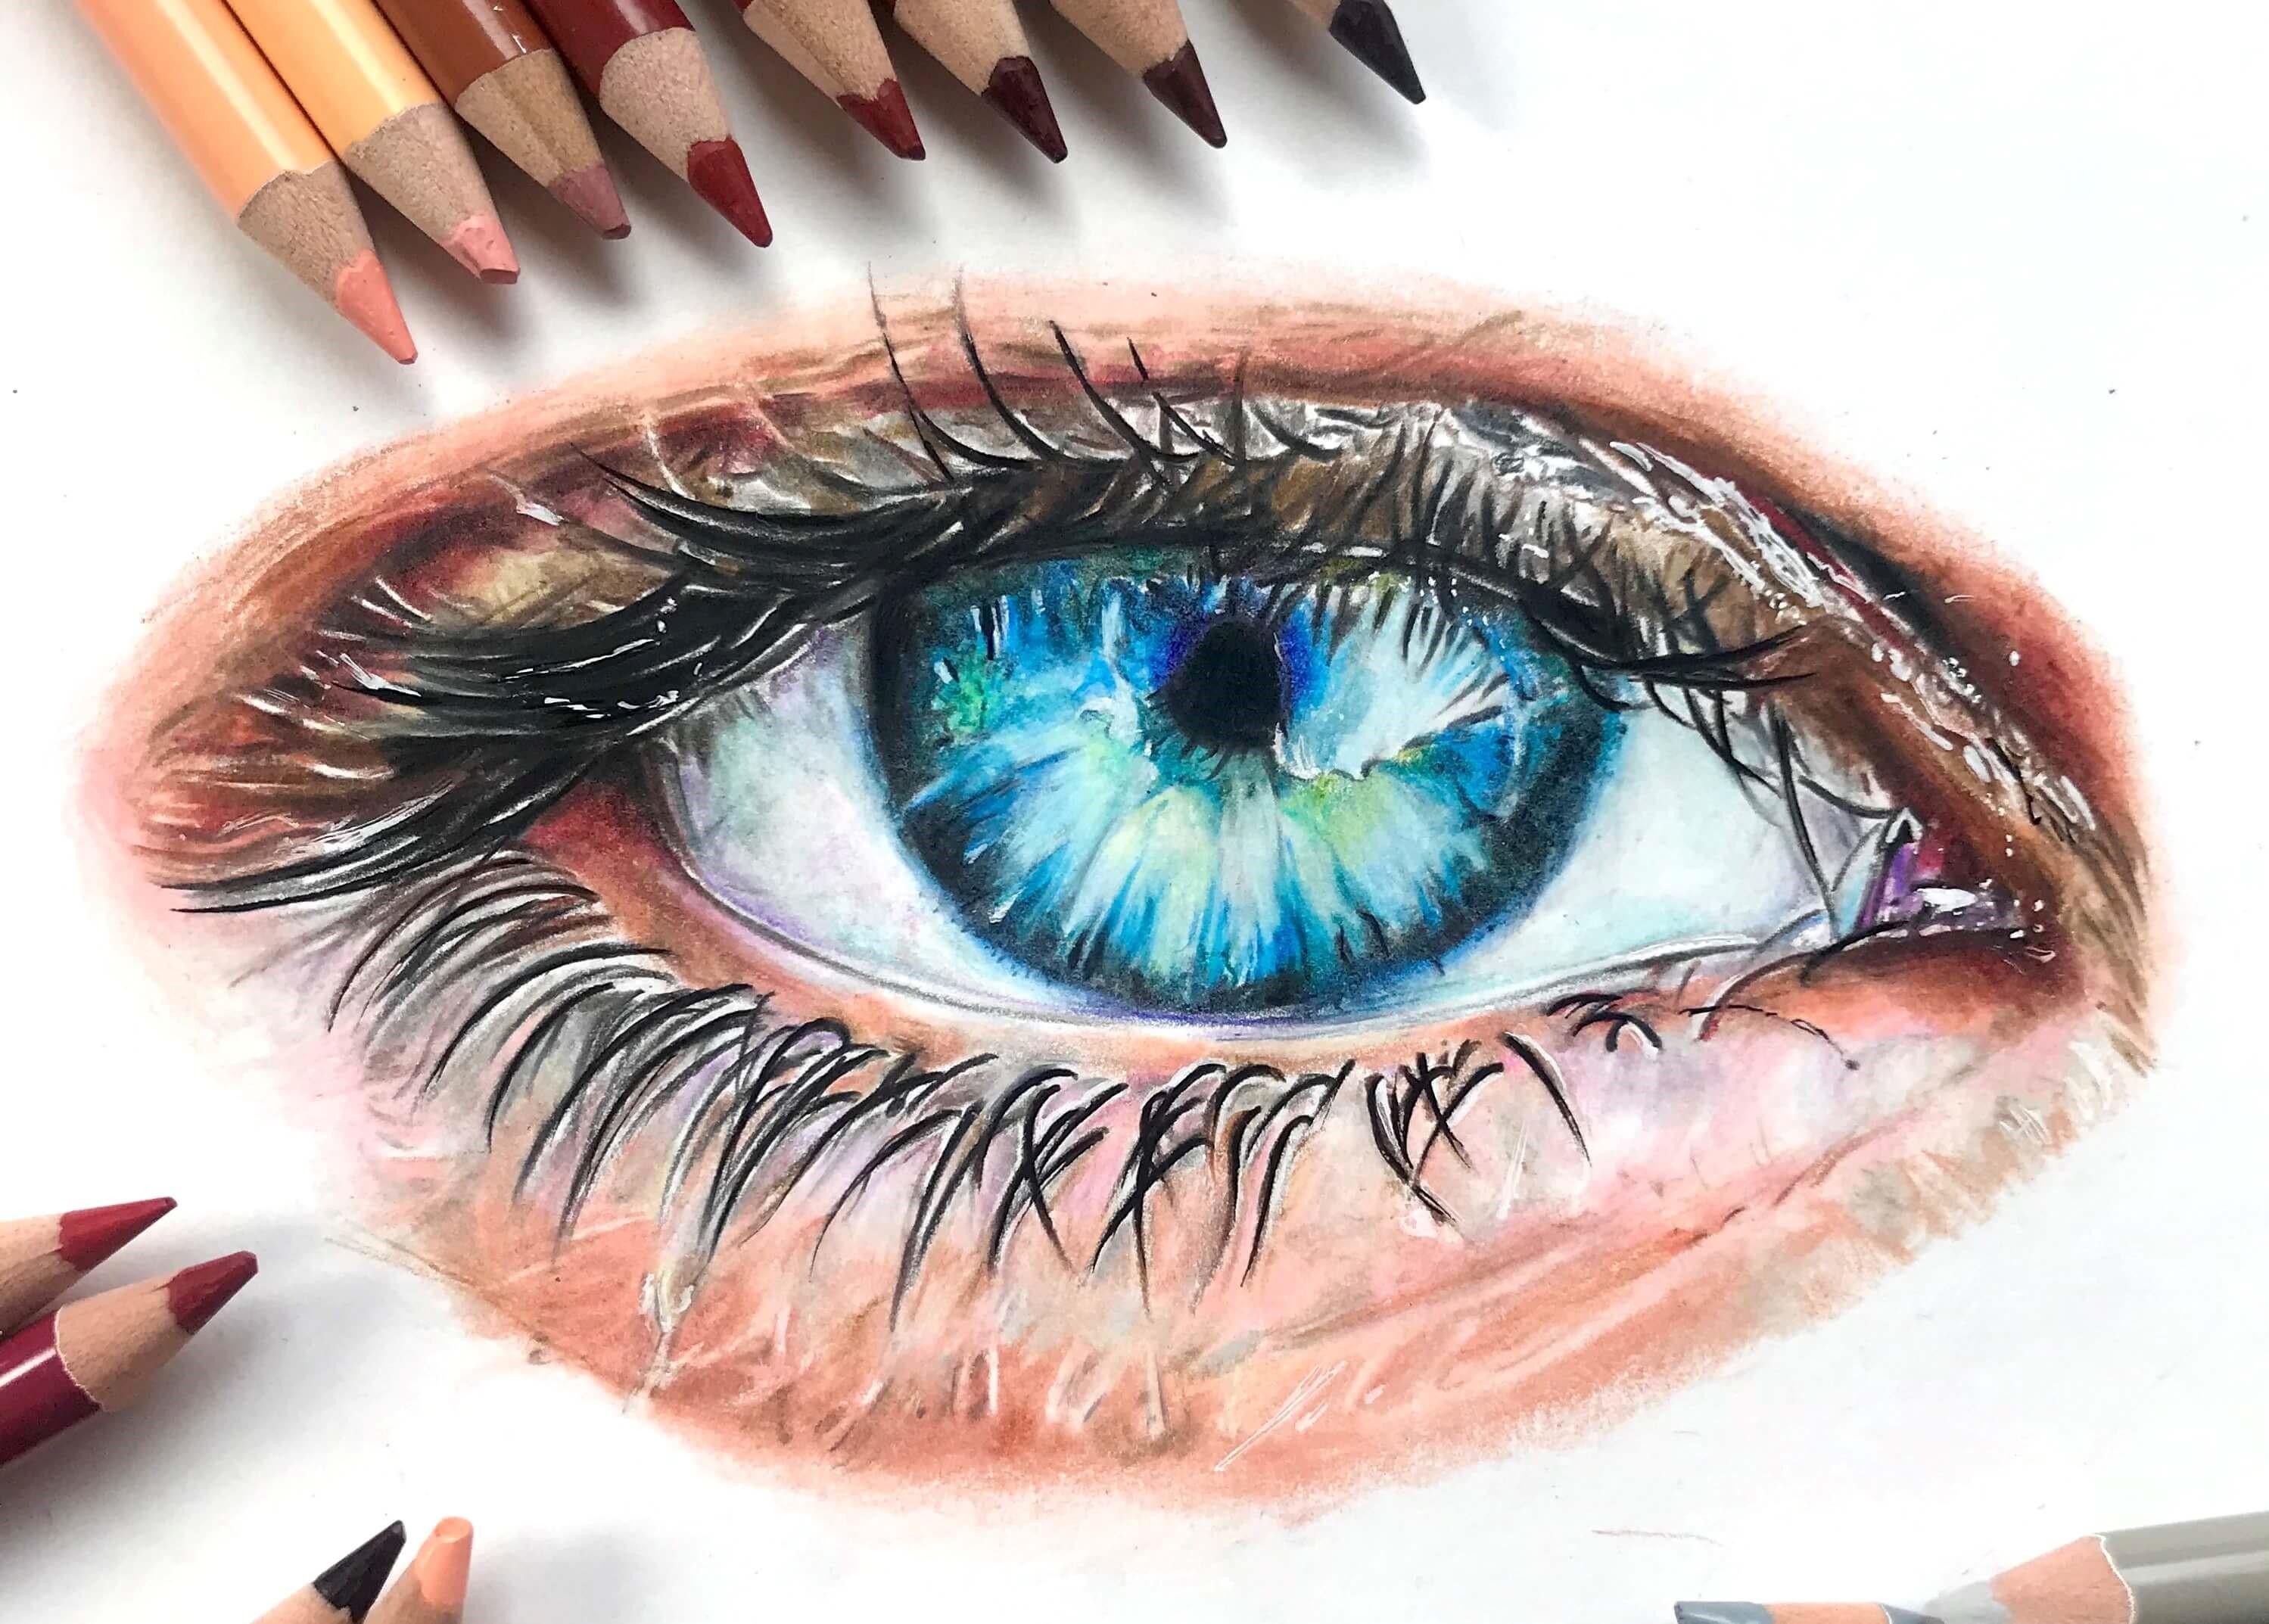 STEP 11: The Skin Above the Eye